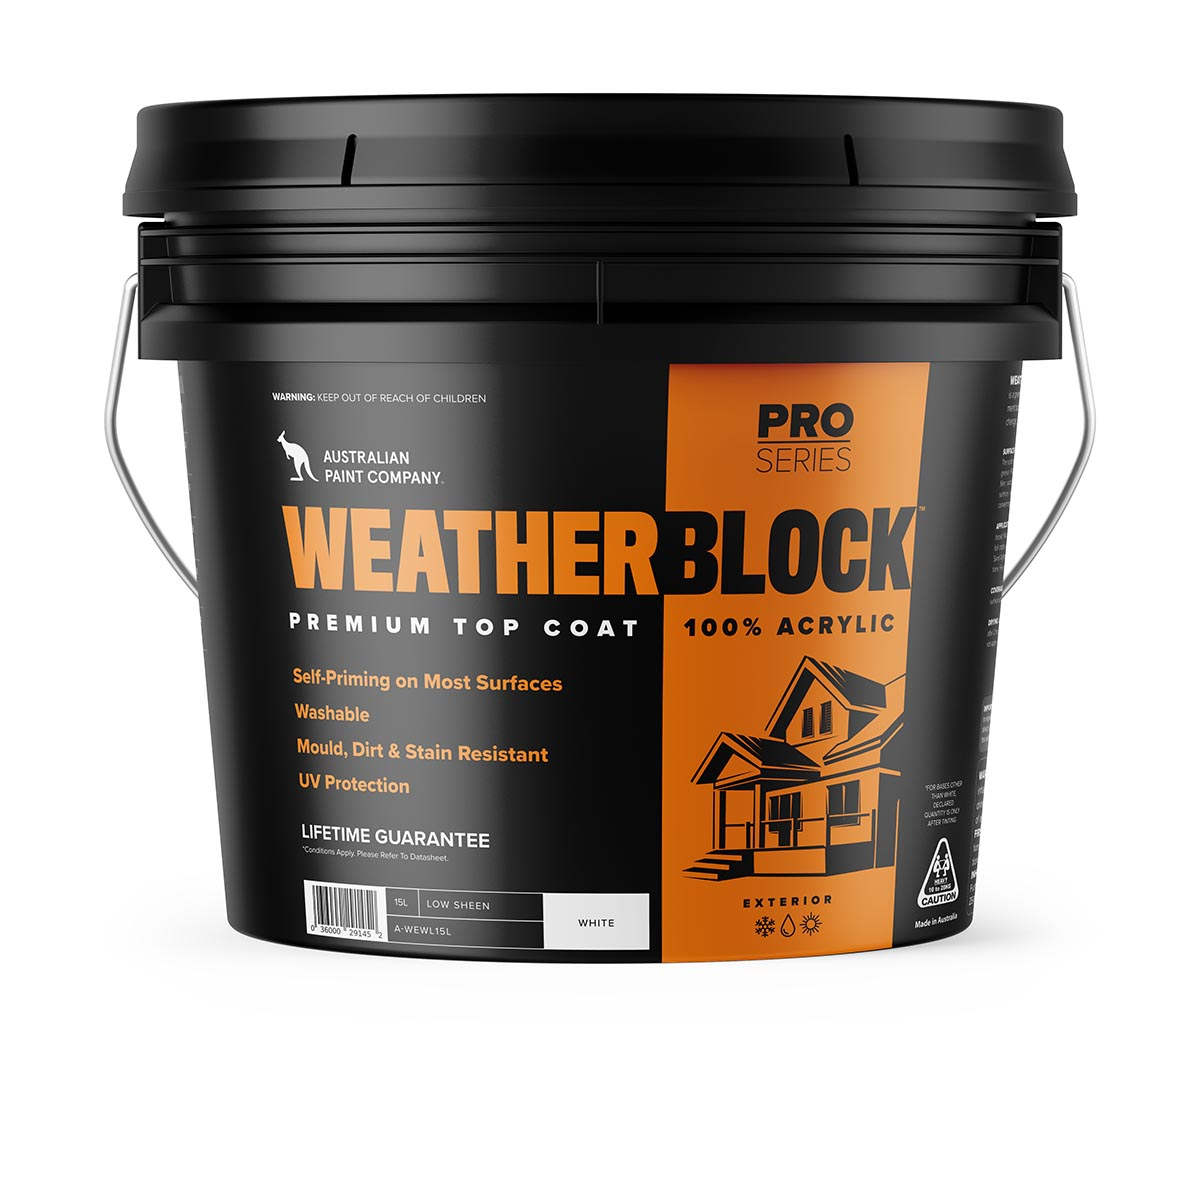 Weatherblock pro series